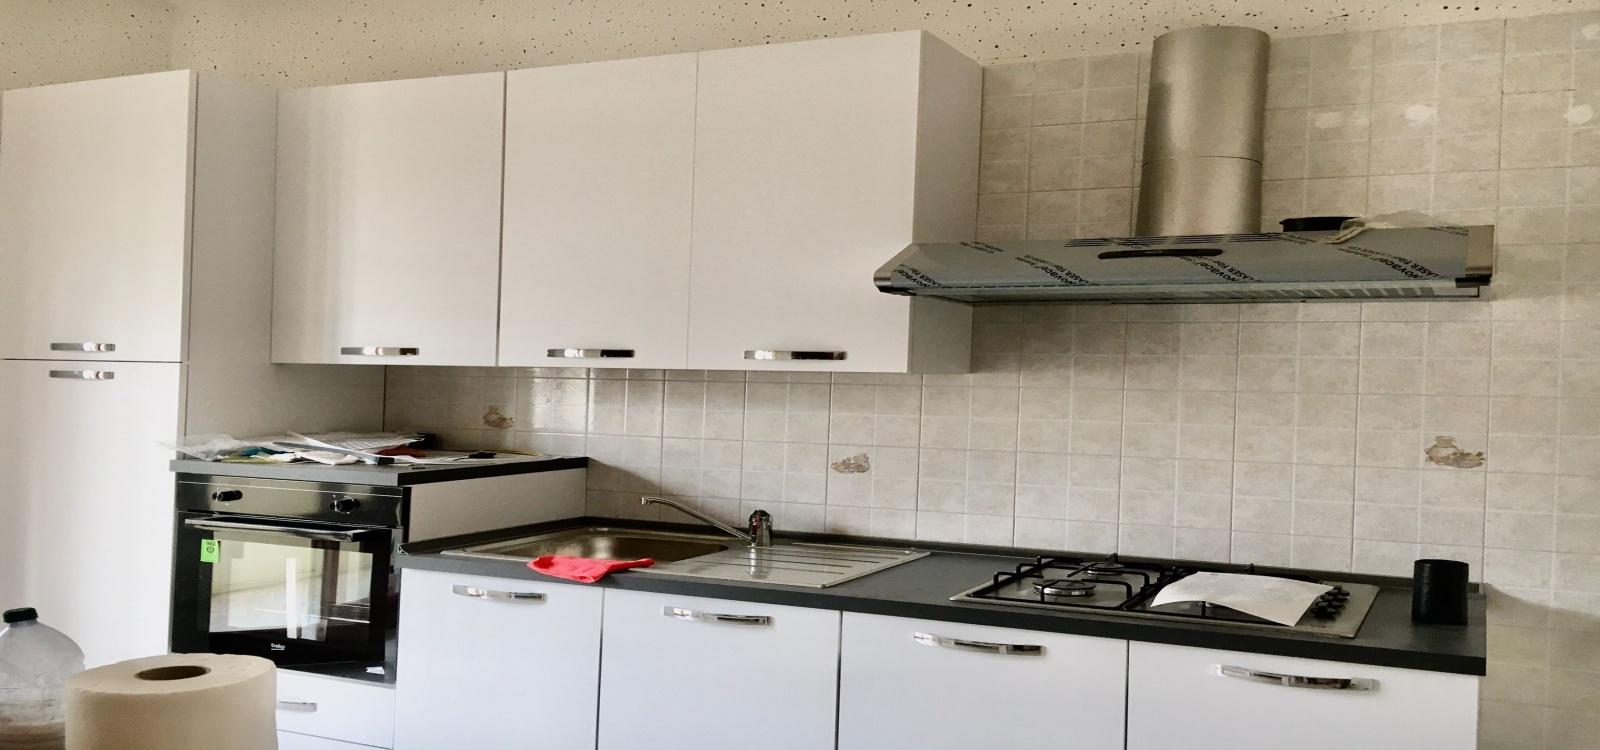 VIALE ZECCHINO,SIRACUSA,Appartamento,VIALE ZECCHINO,2452